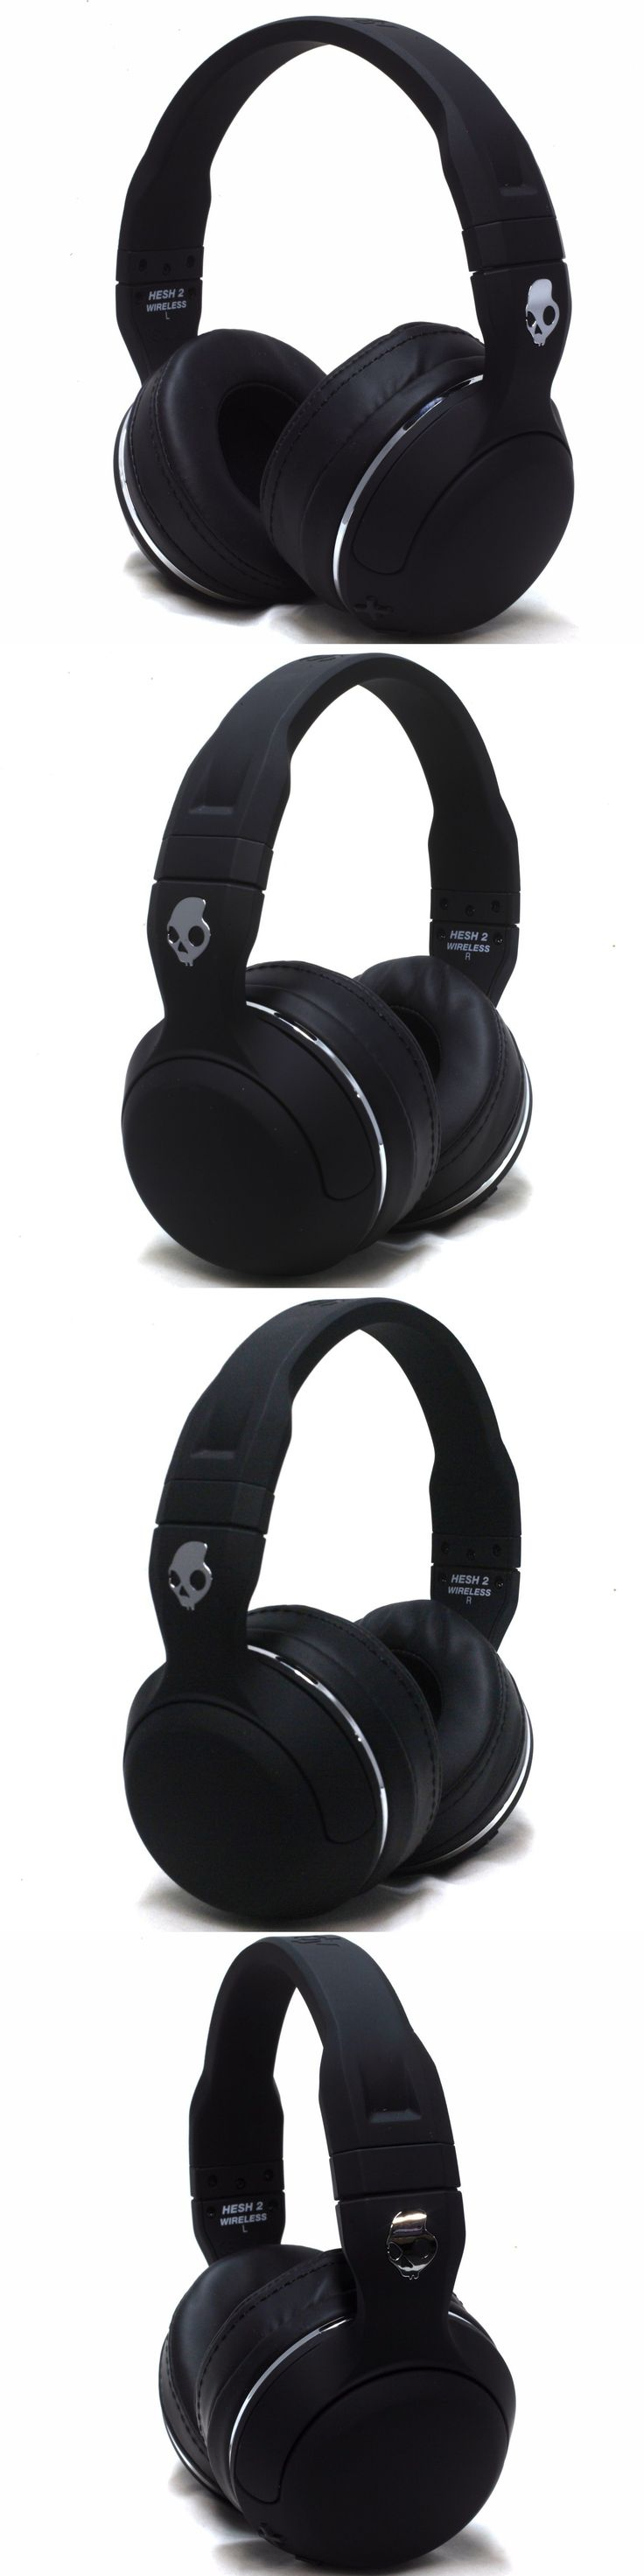 electronics: New Skullcandy Hesh 2 Bluetooth Wireless Headphones Headset With Mic Black -> BUY IT NOW ONLY: $38.97 on eBay!